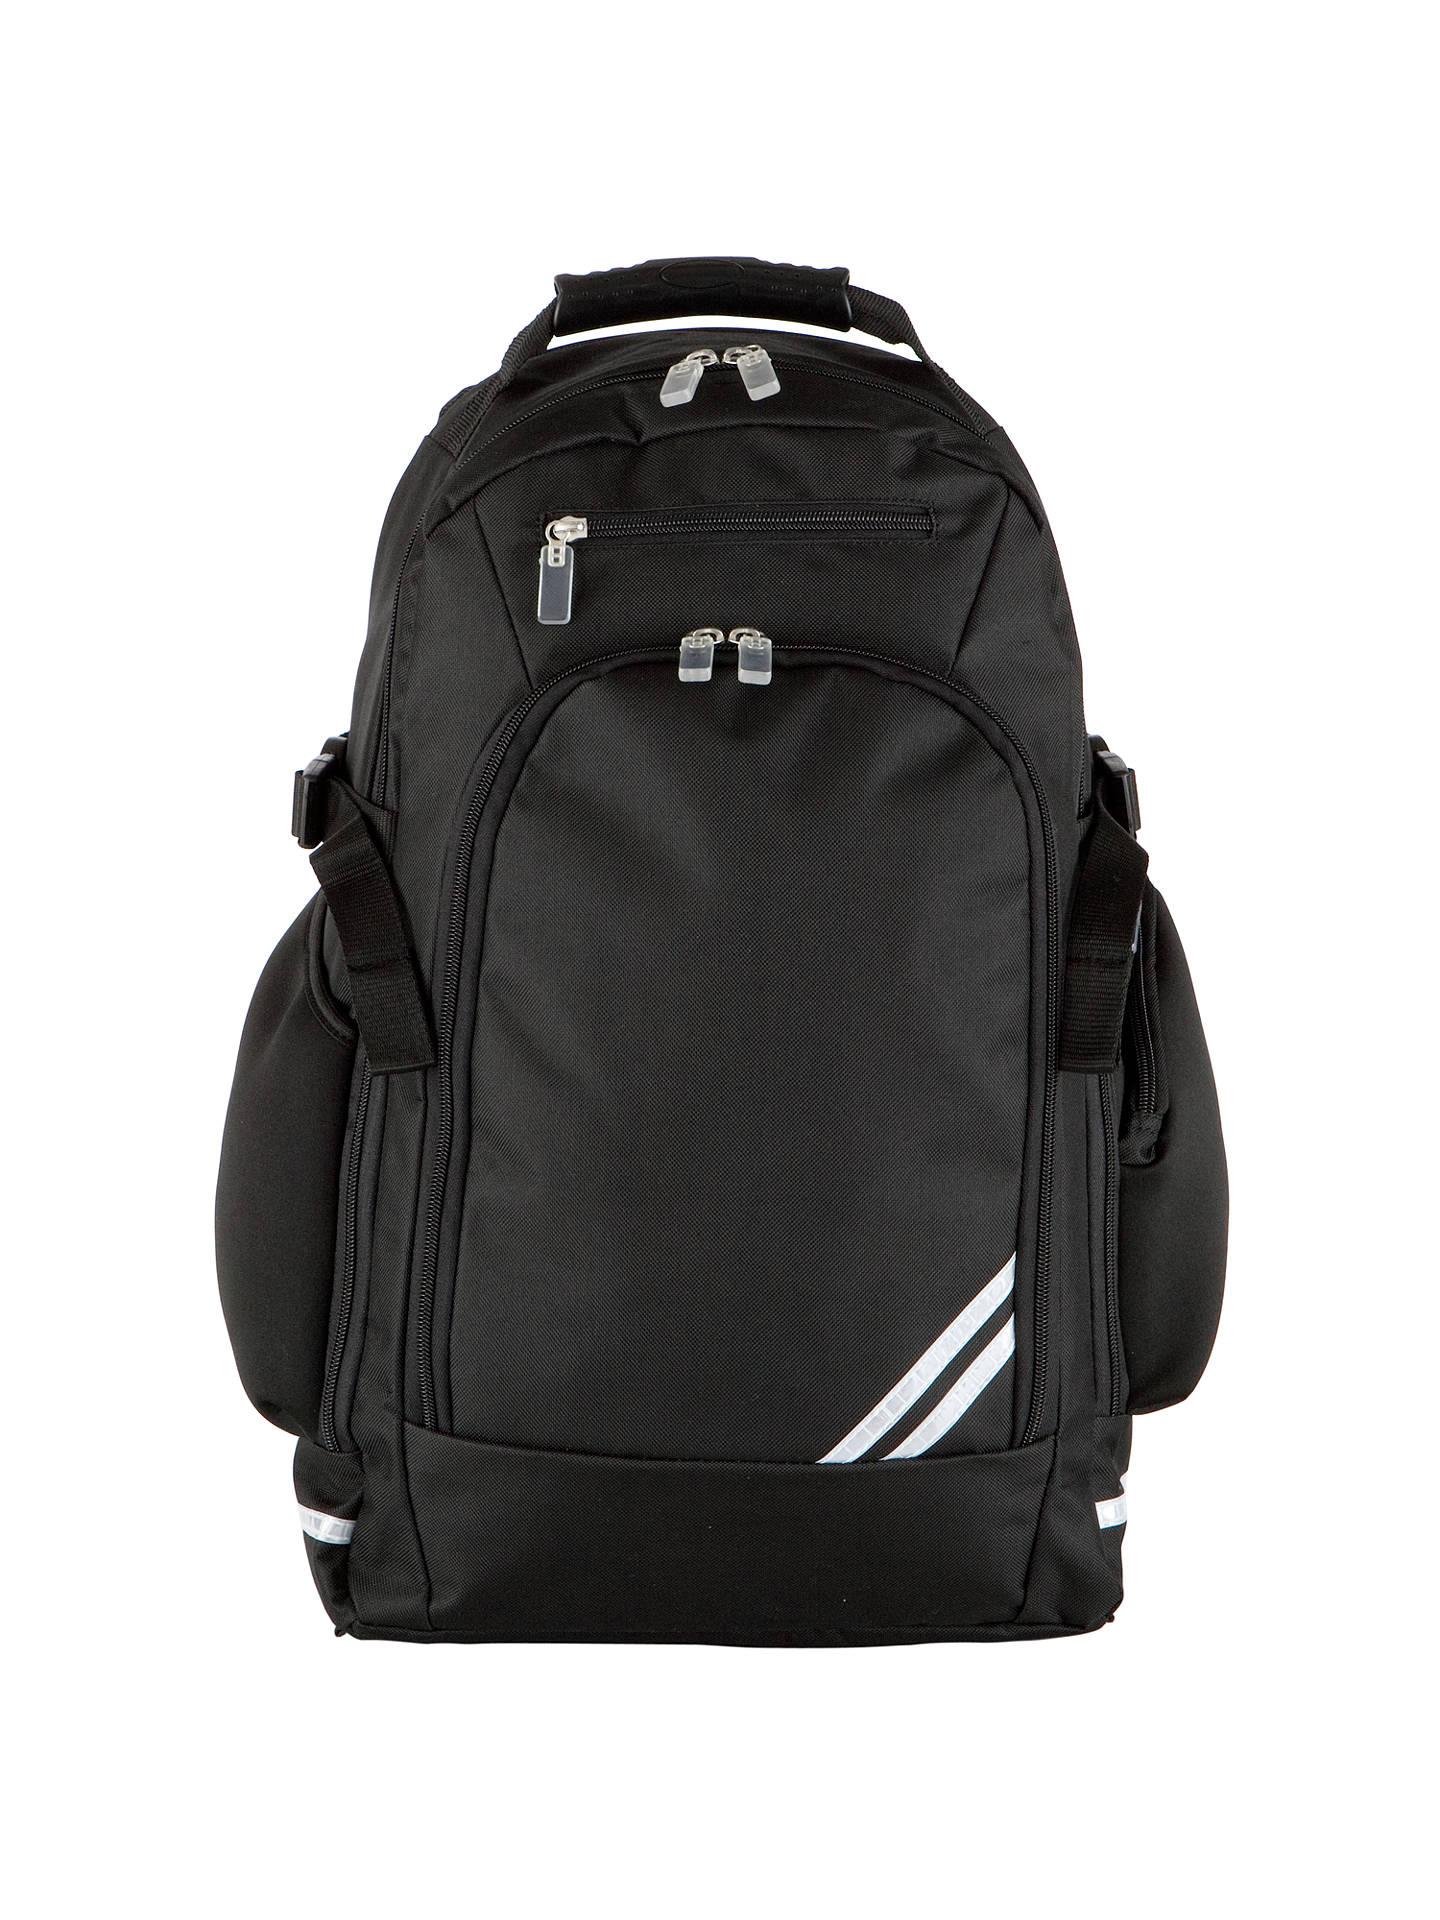 e8ac98e64c85 BuyBackcare Backpack, Large, Black Online at johnlewis.com ...